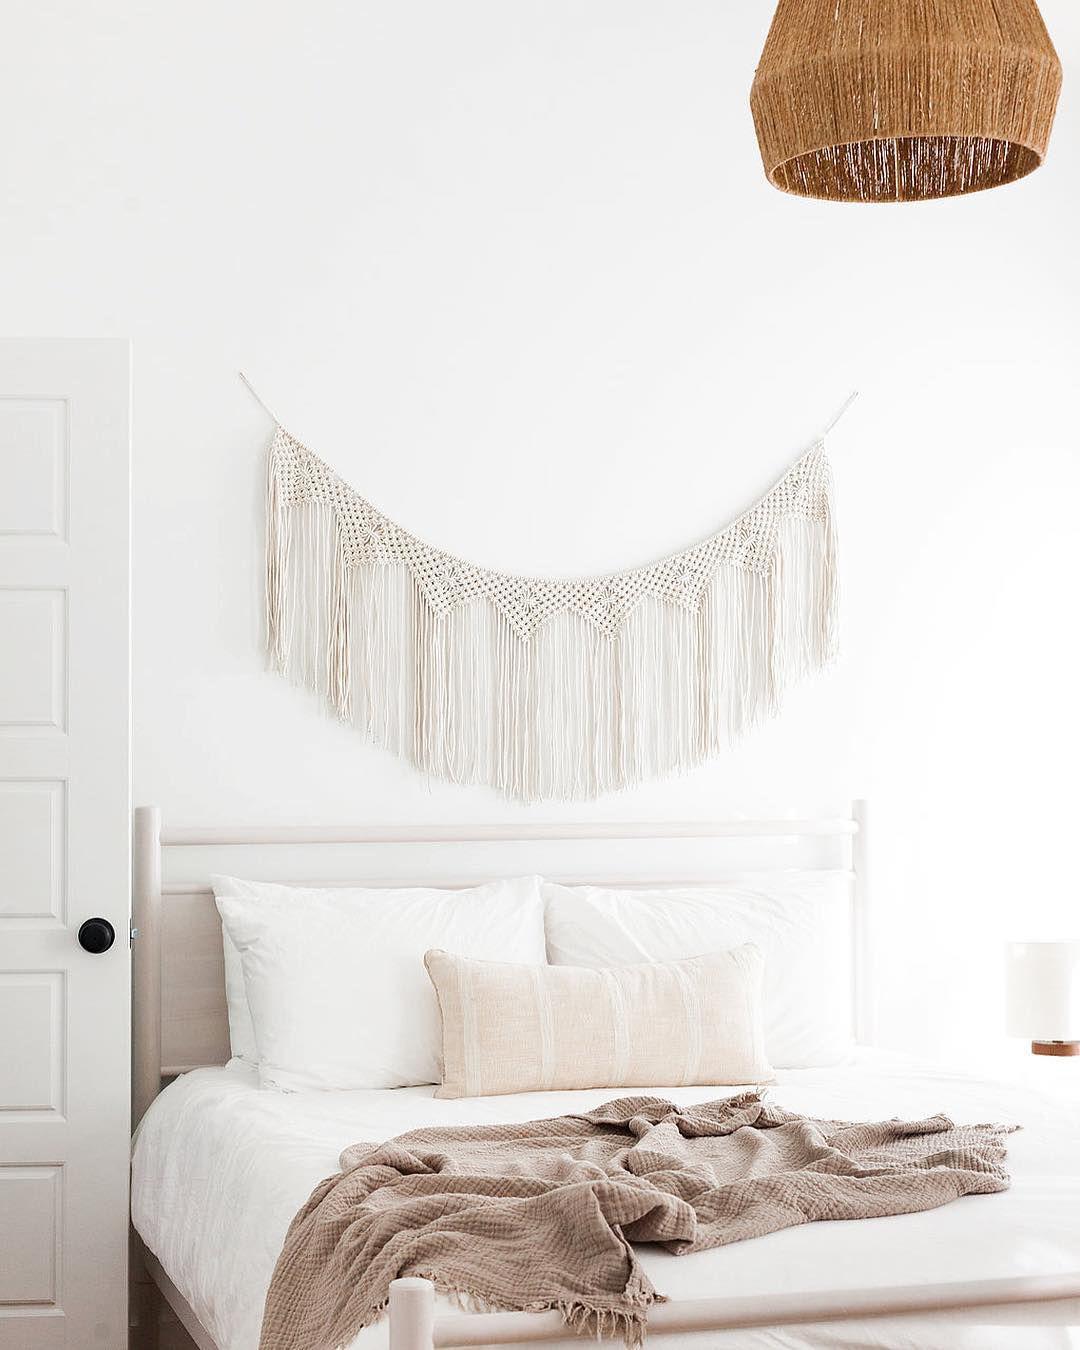 Macramé above a bed